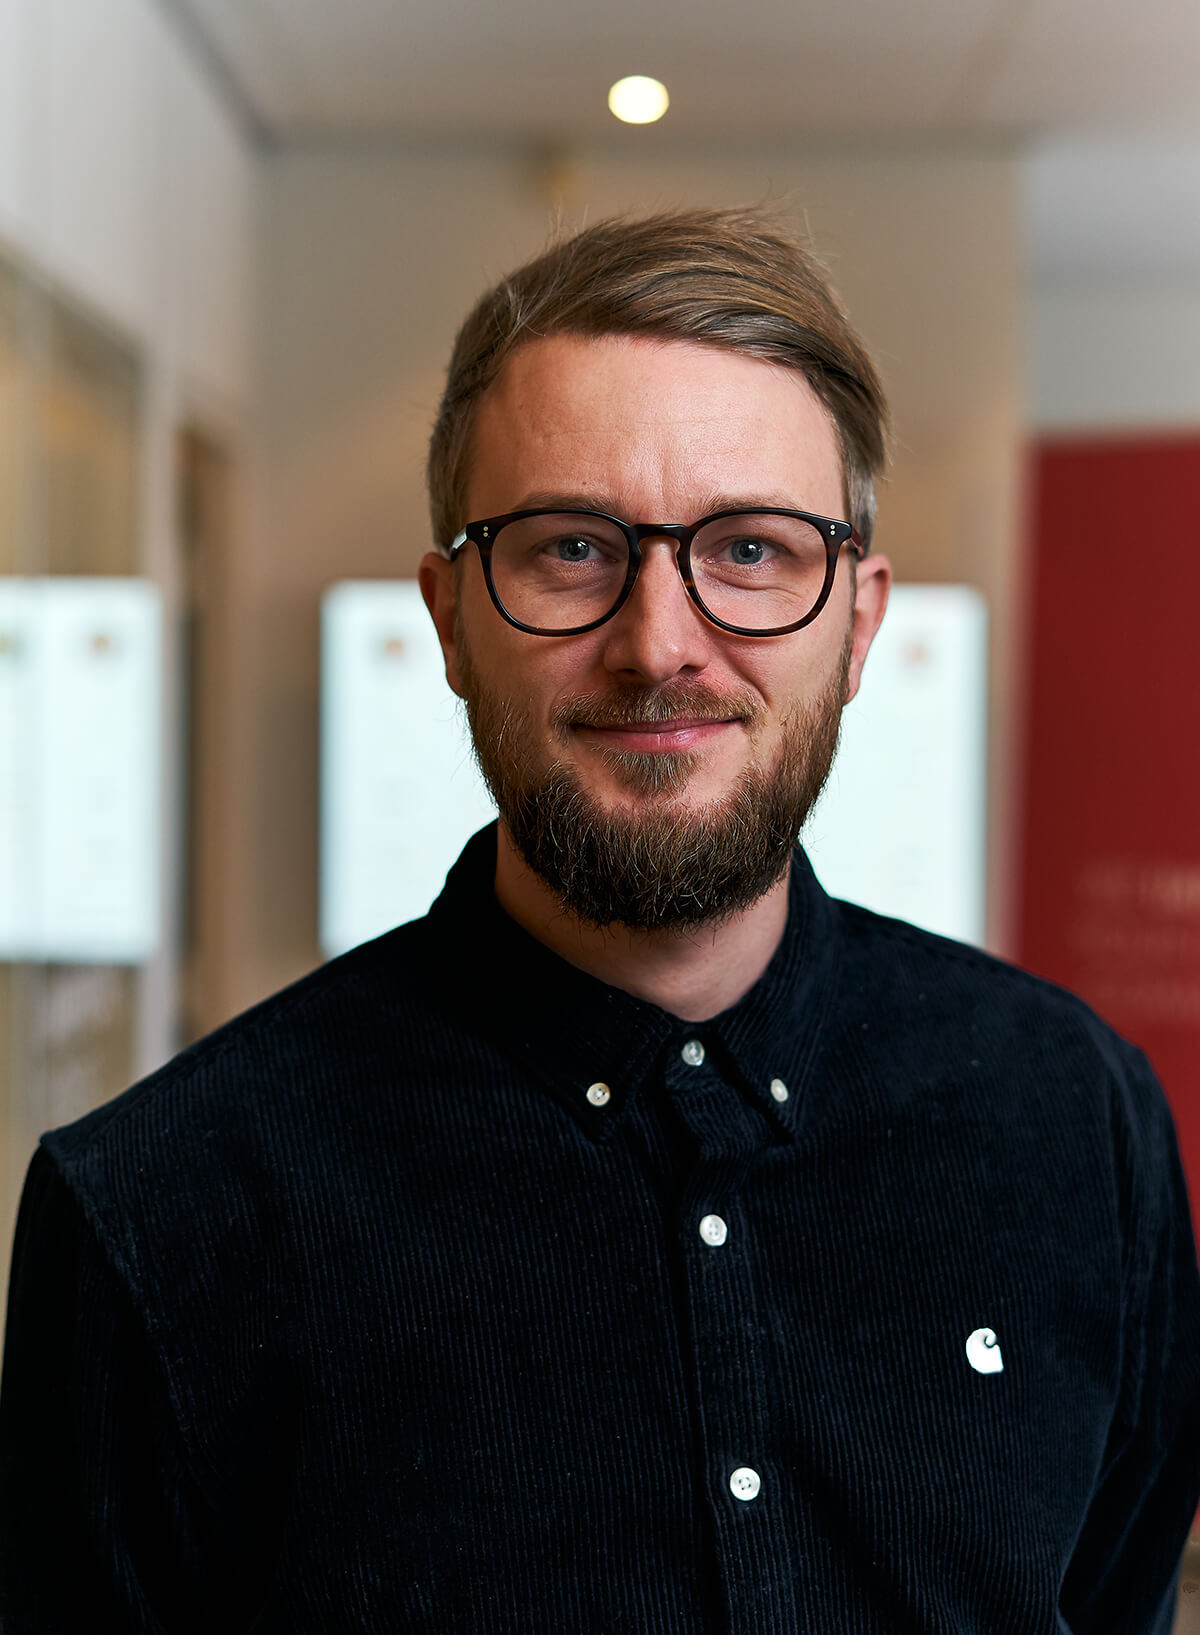 Morten Messer